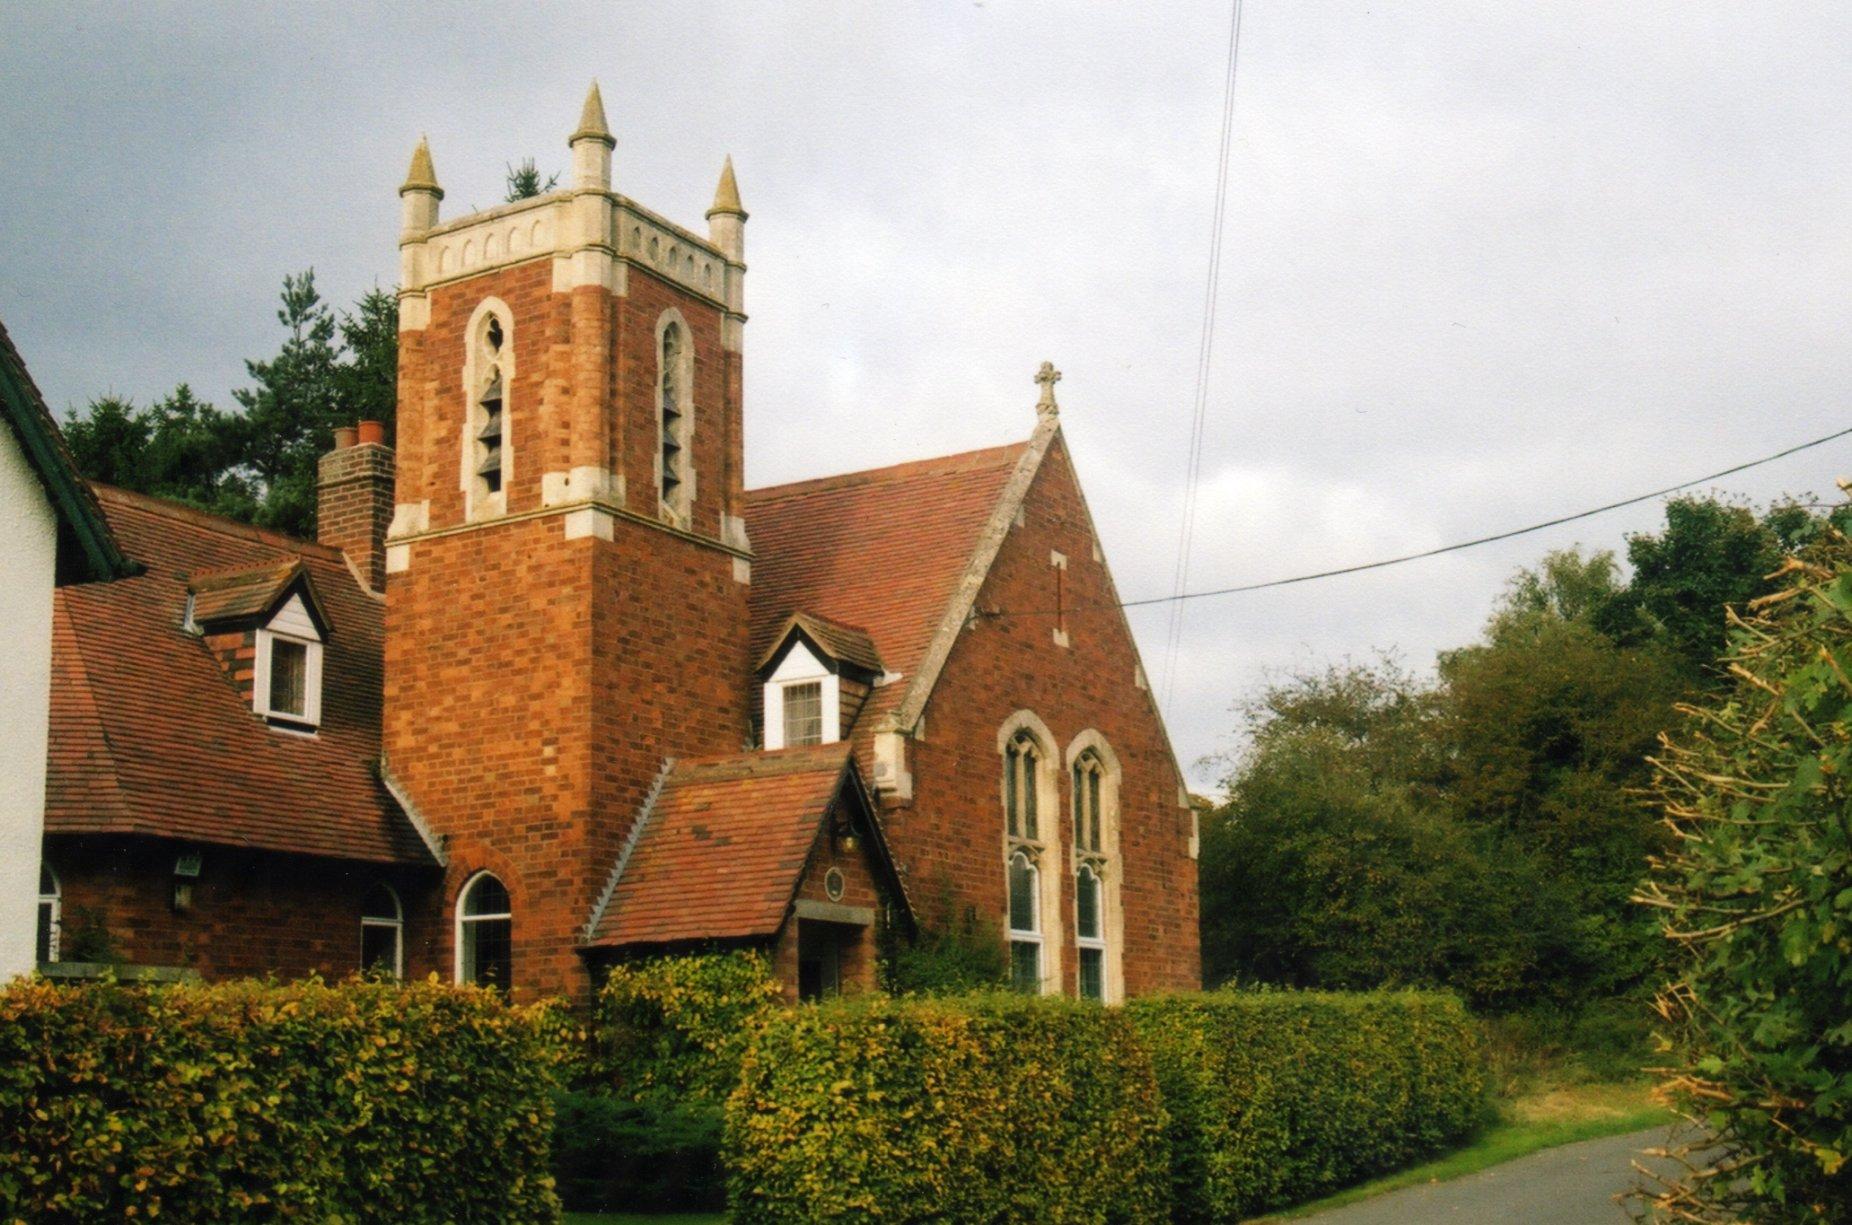 Fillongley Methodist Church